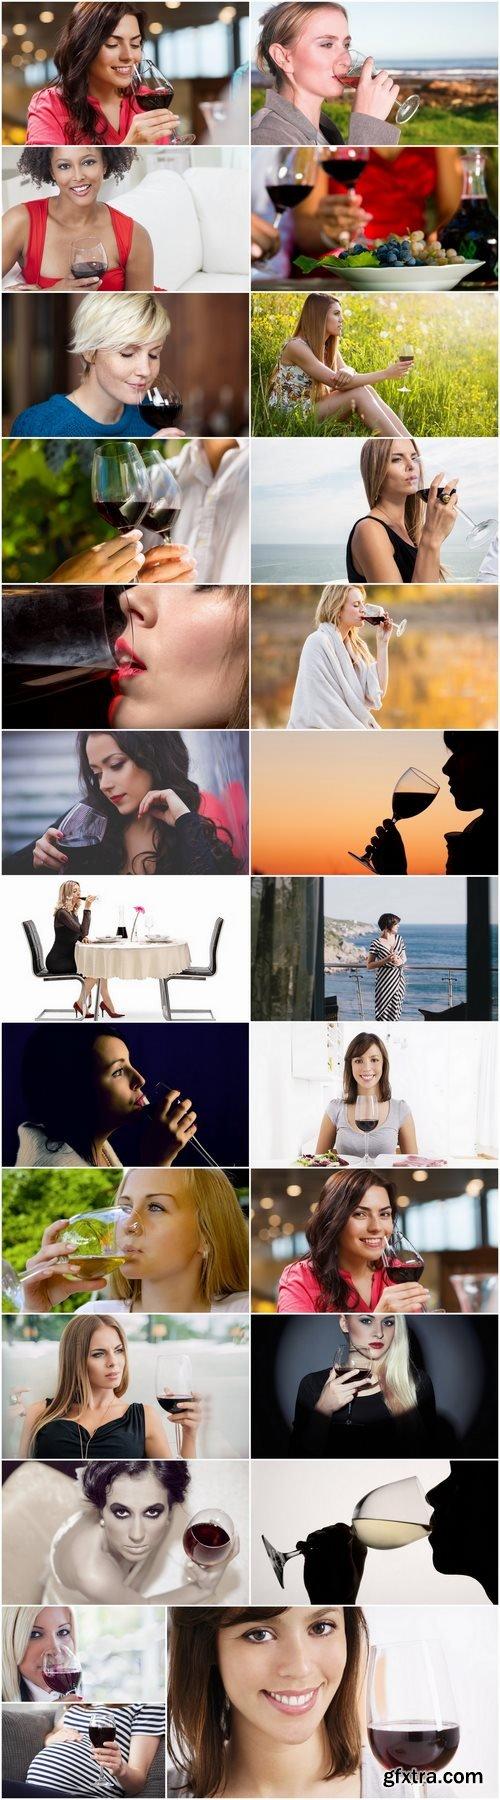 Woman girl drinking wine glass cup jar 25 HQ Jpeg